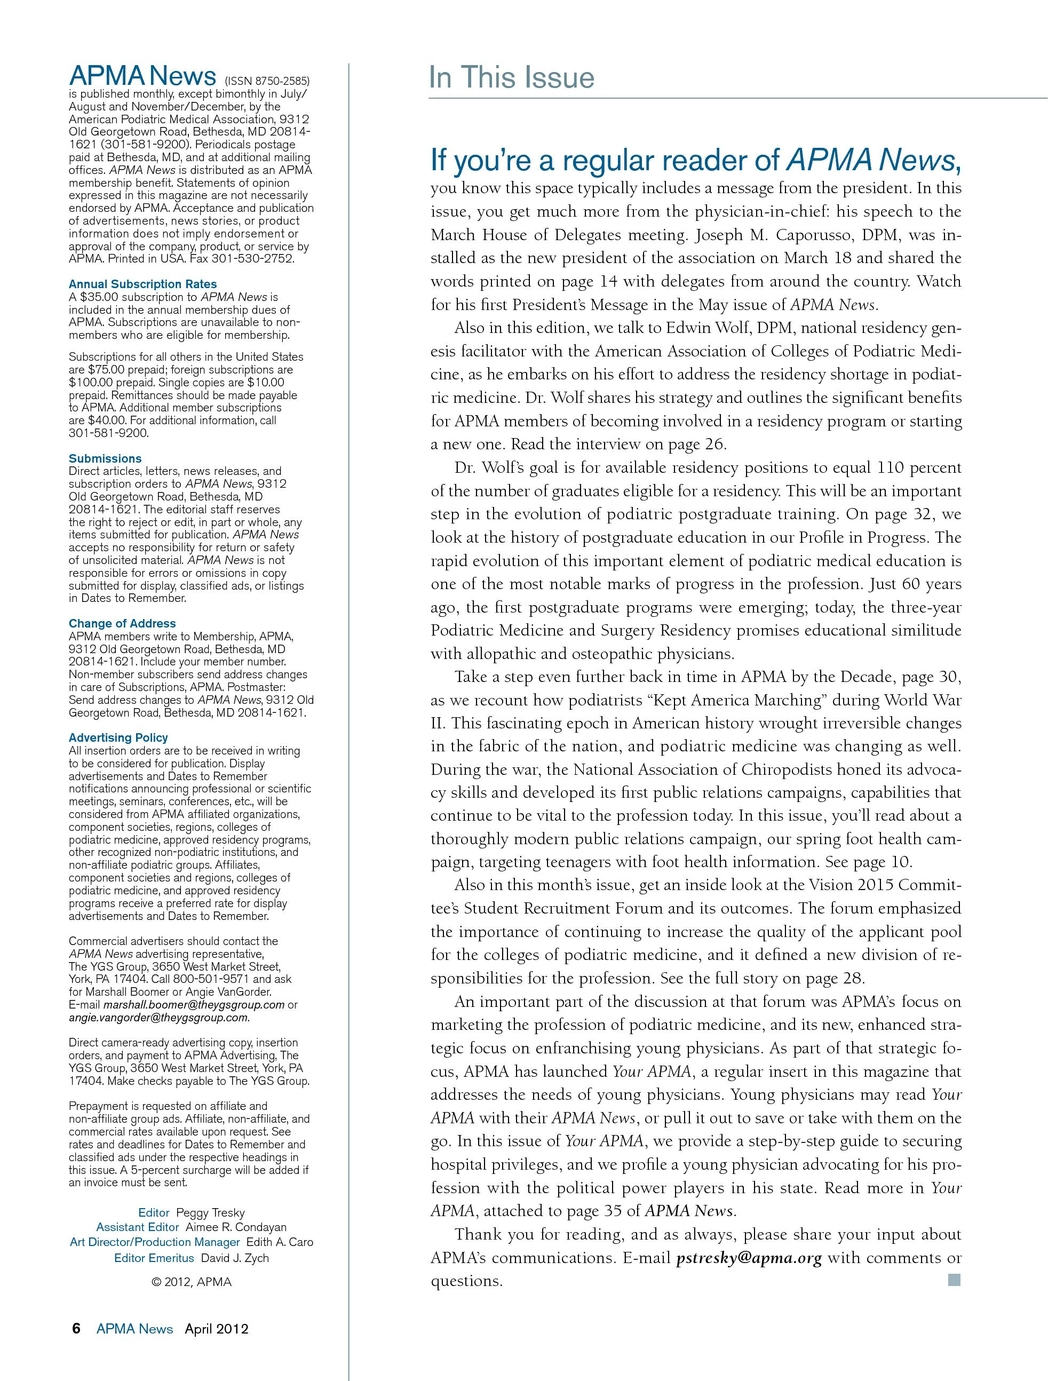 APMA News - April 2012